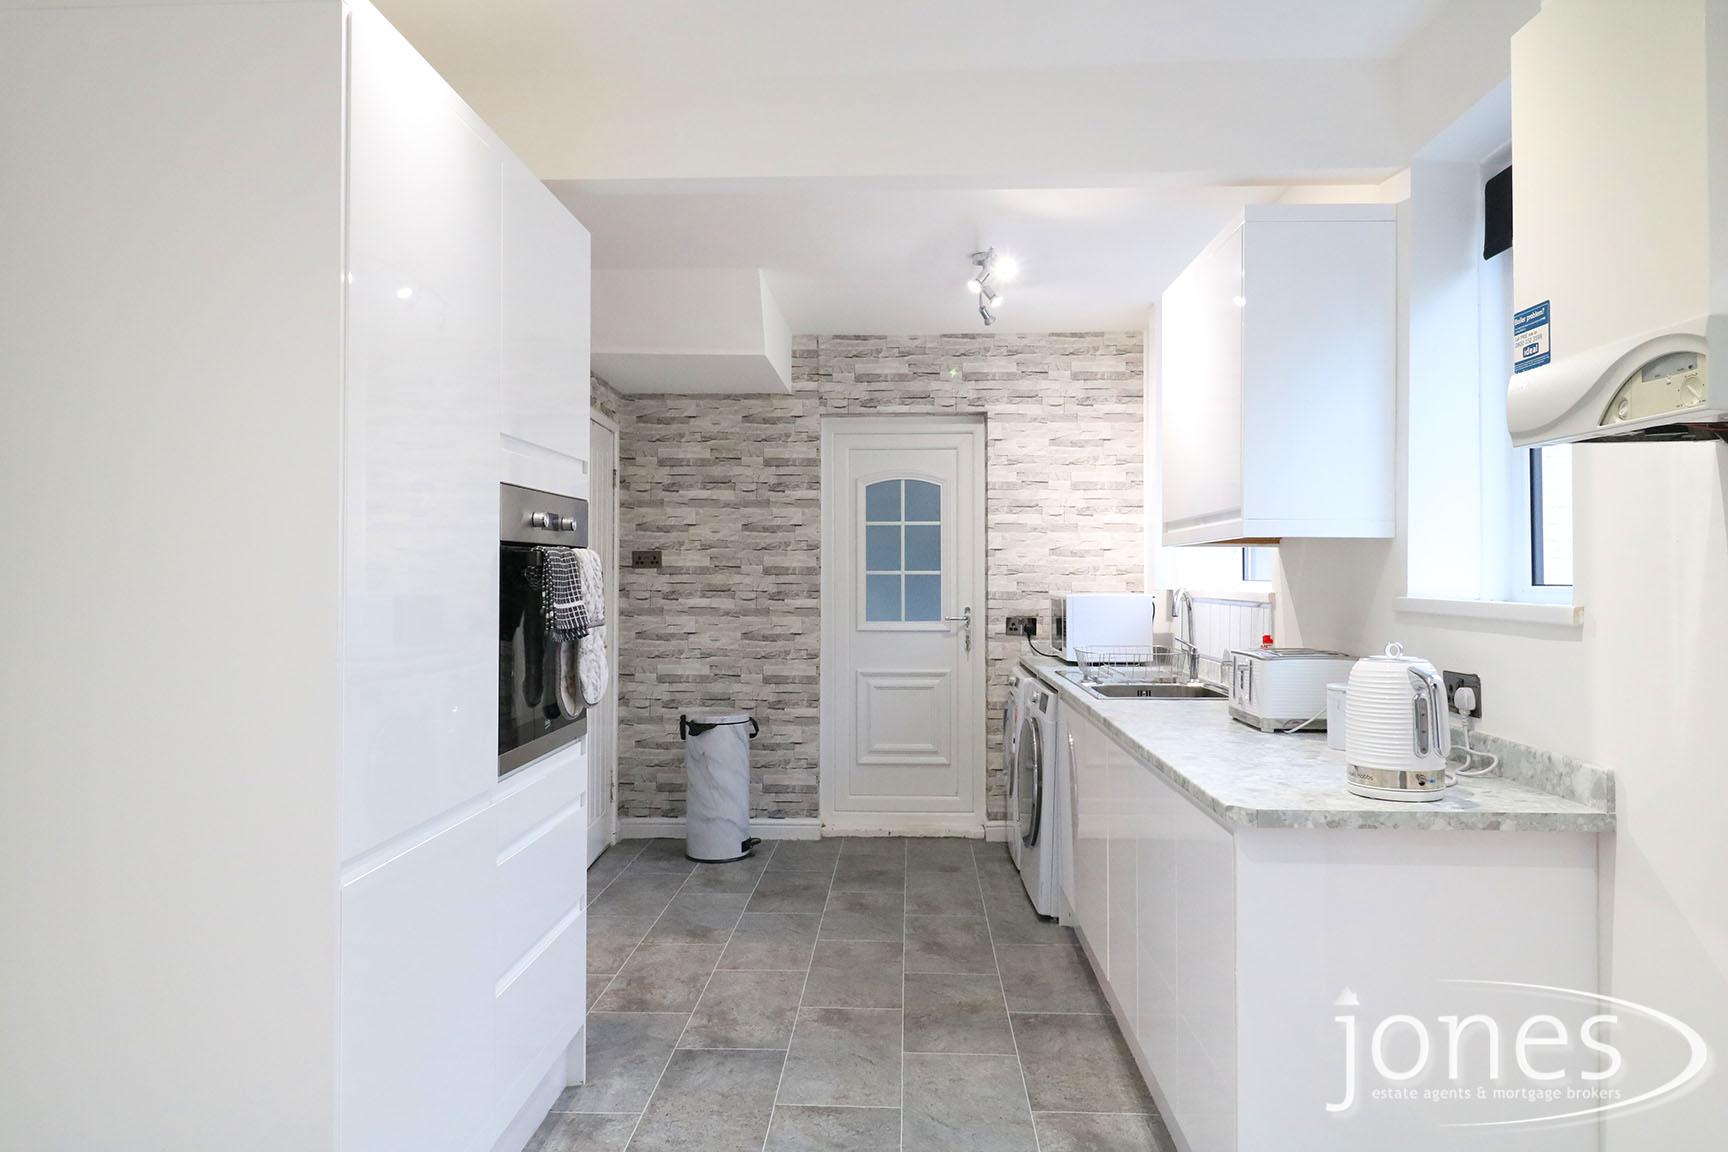 Home for Sale Let - Photo 04 Feetham Avenue, Darlington, DL1 2DY